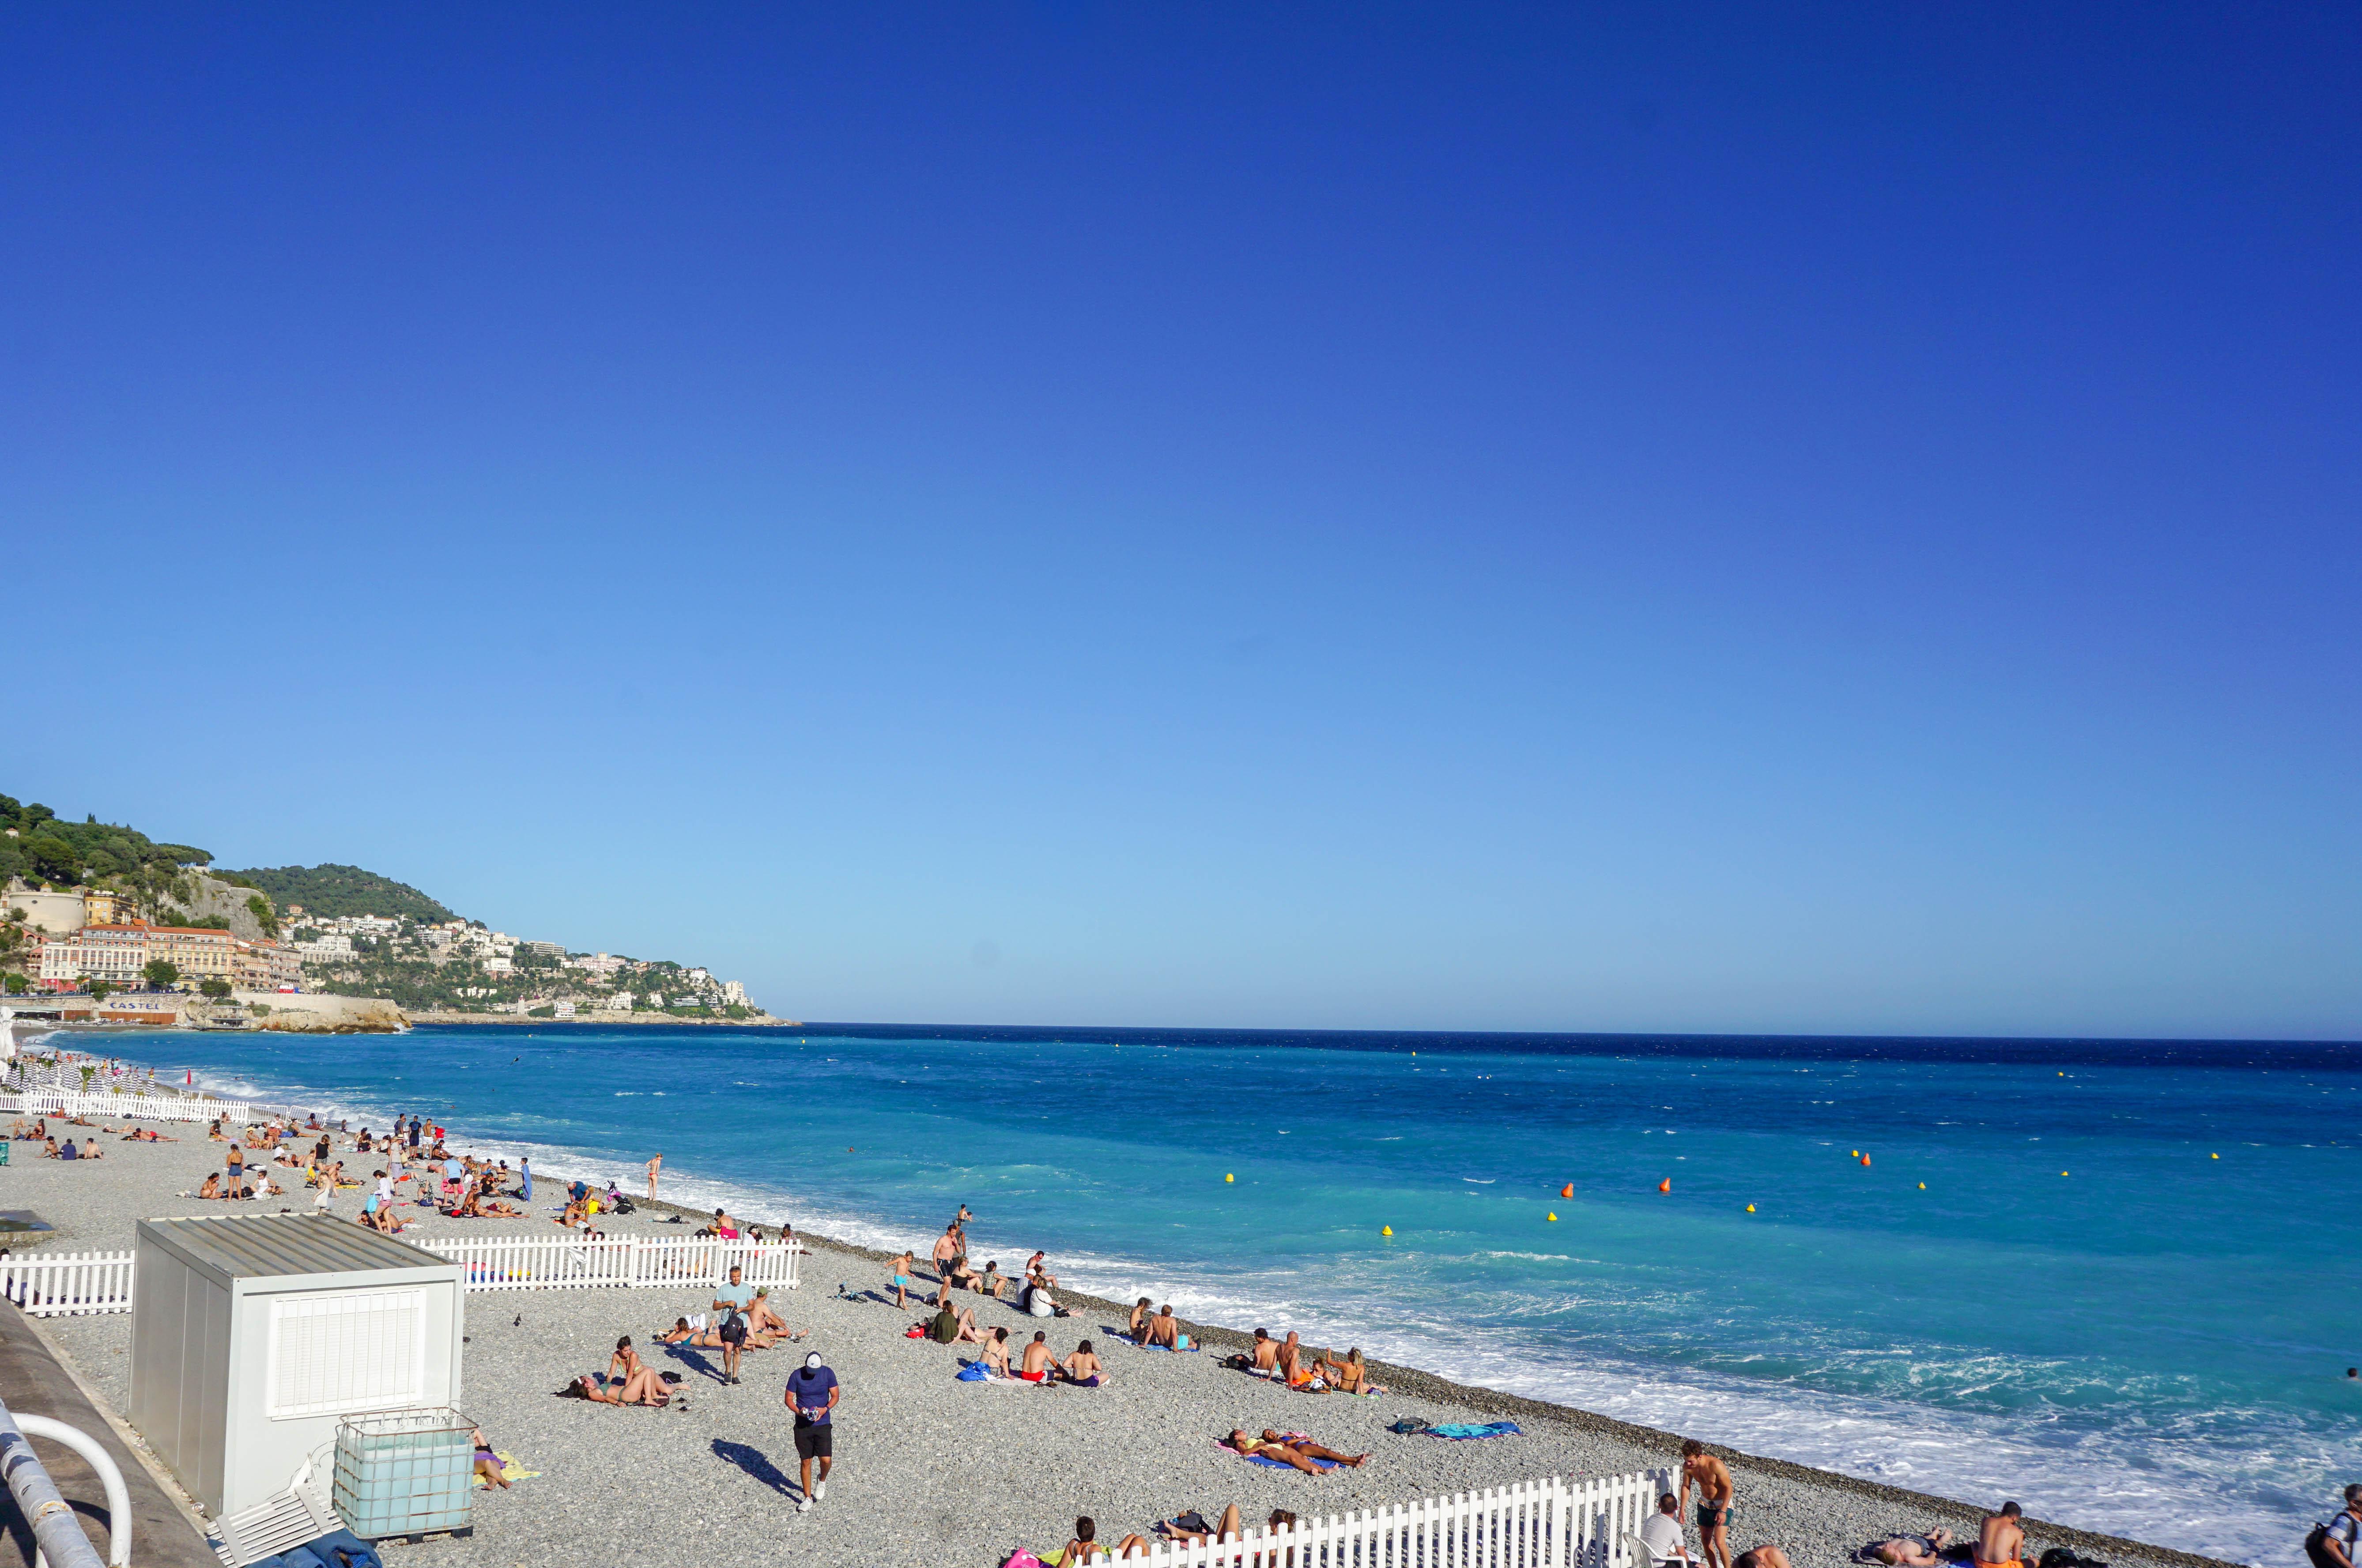 Blue sea, cote d'azur in Nice, France